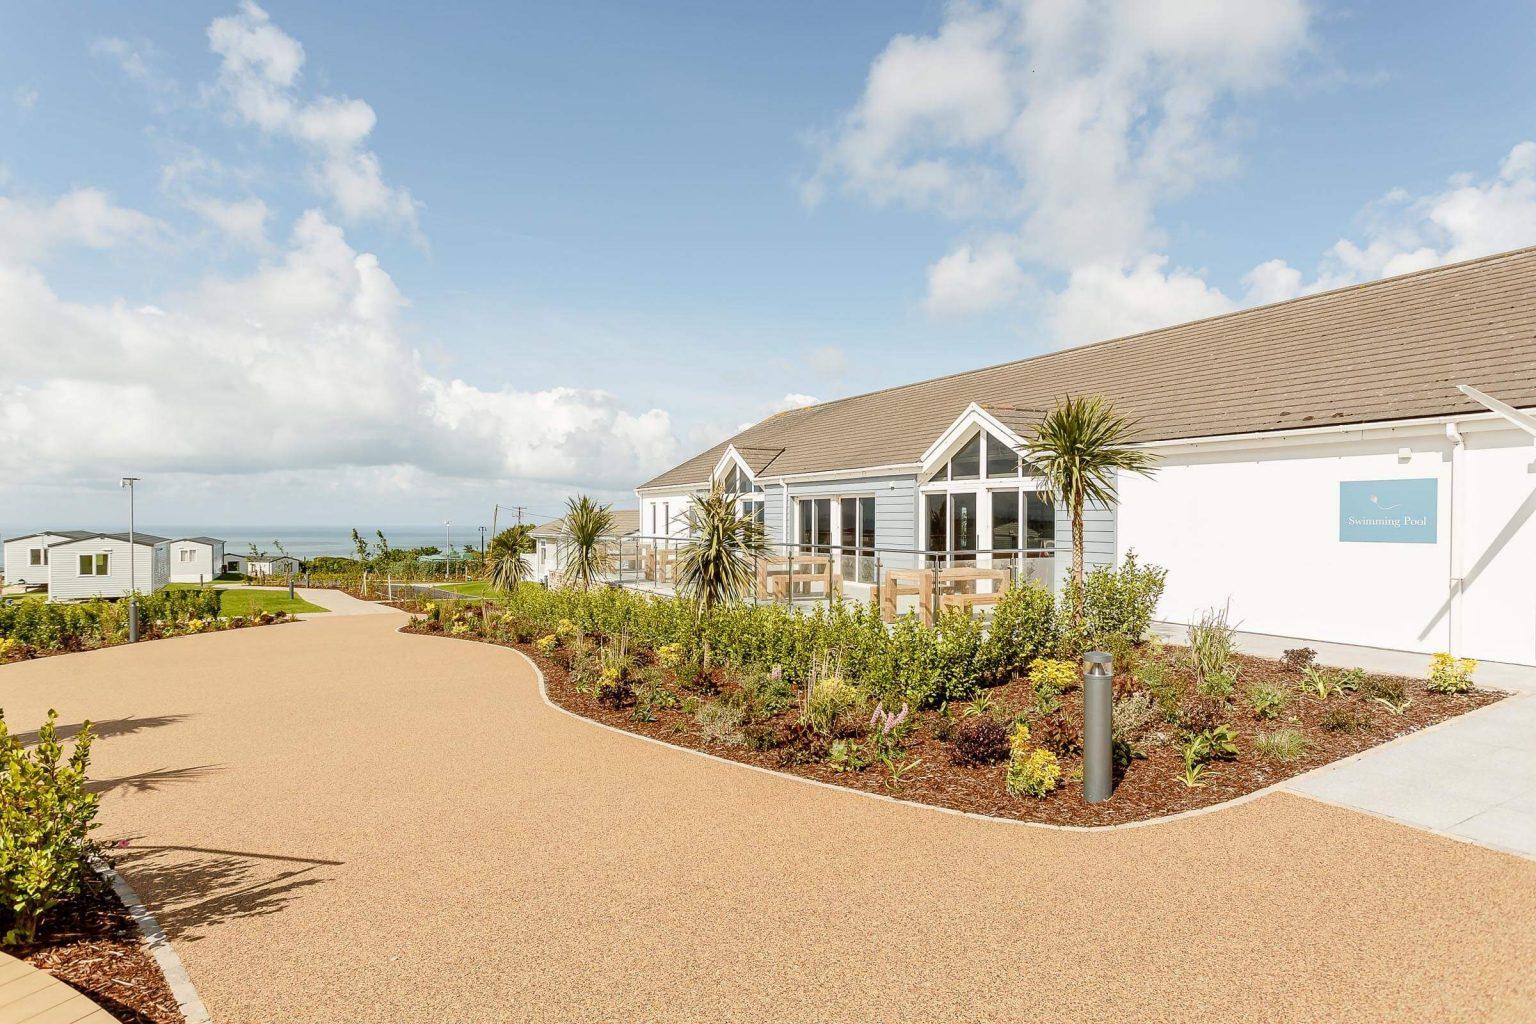 Sandymouth Holiday Resort